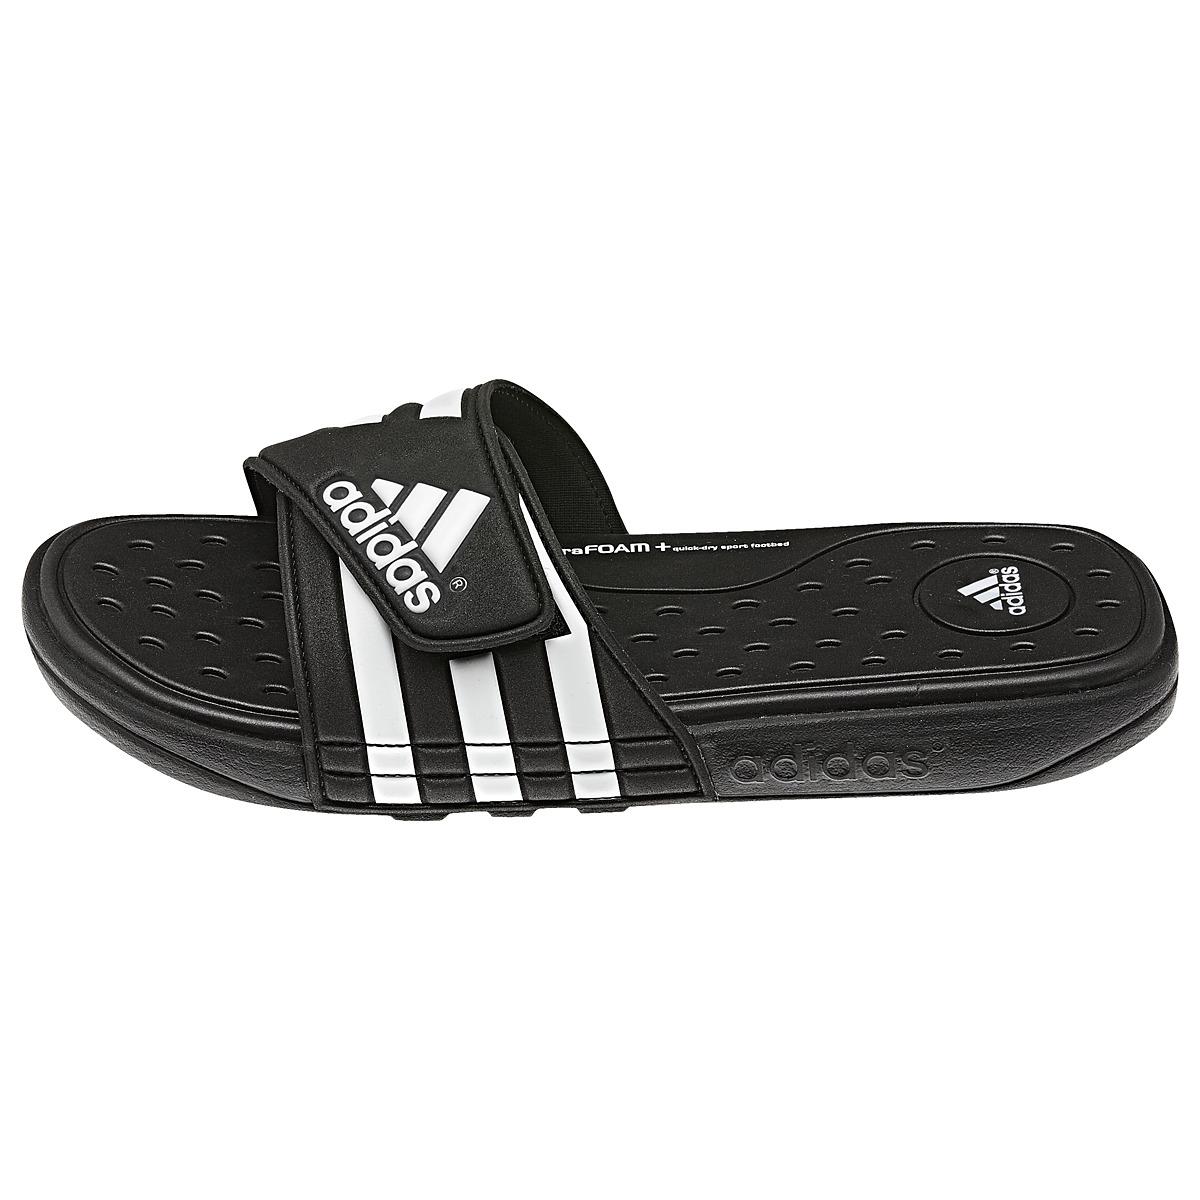 adidas adissage sc schuhe sandalen badelatschen badeschuhe herren schwarz ebay. Black Bedroom Furniture Sets. Home Design Ideas